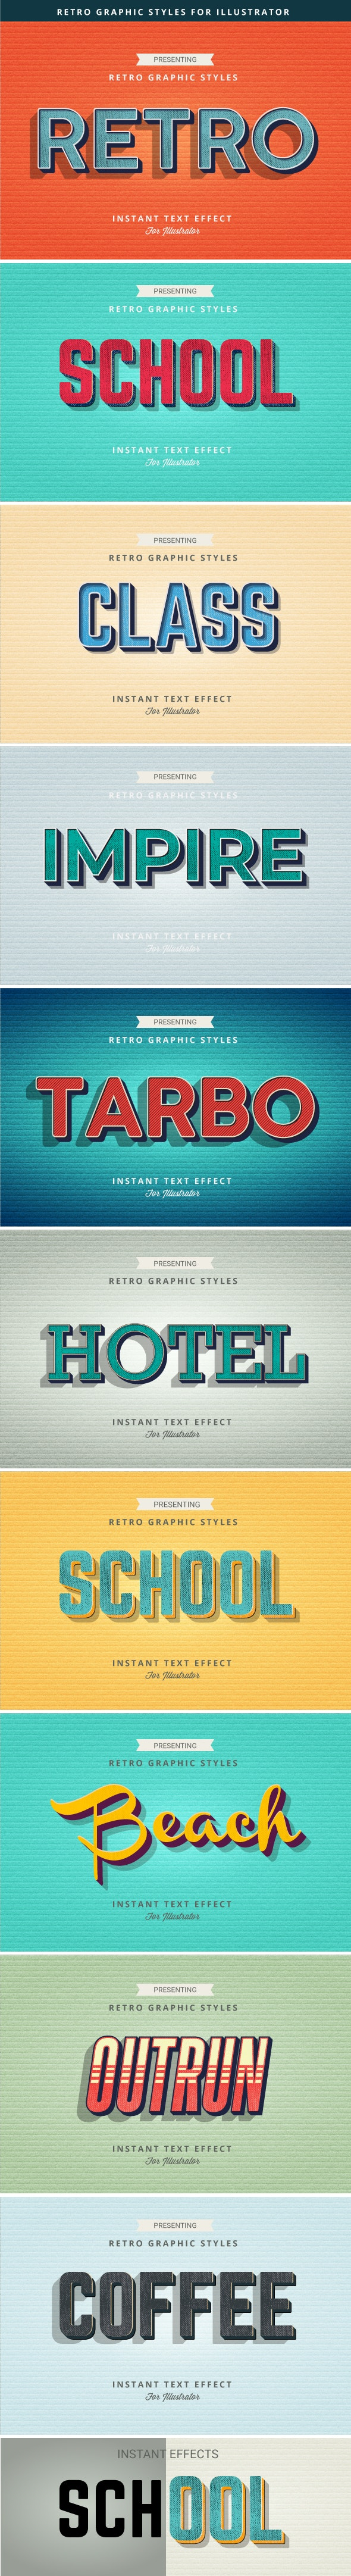 Retro Text Effects - Styles Illustrator